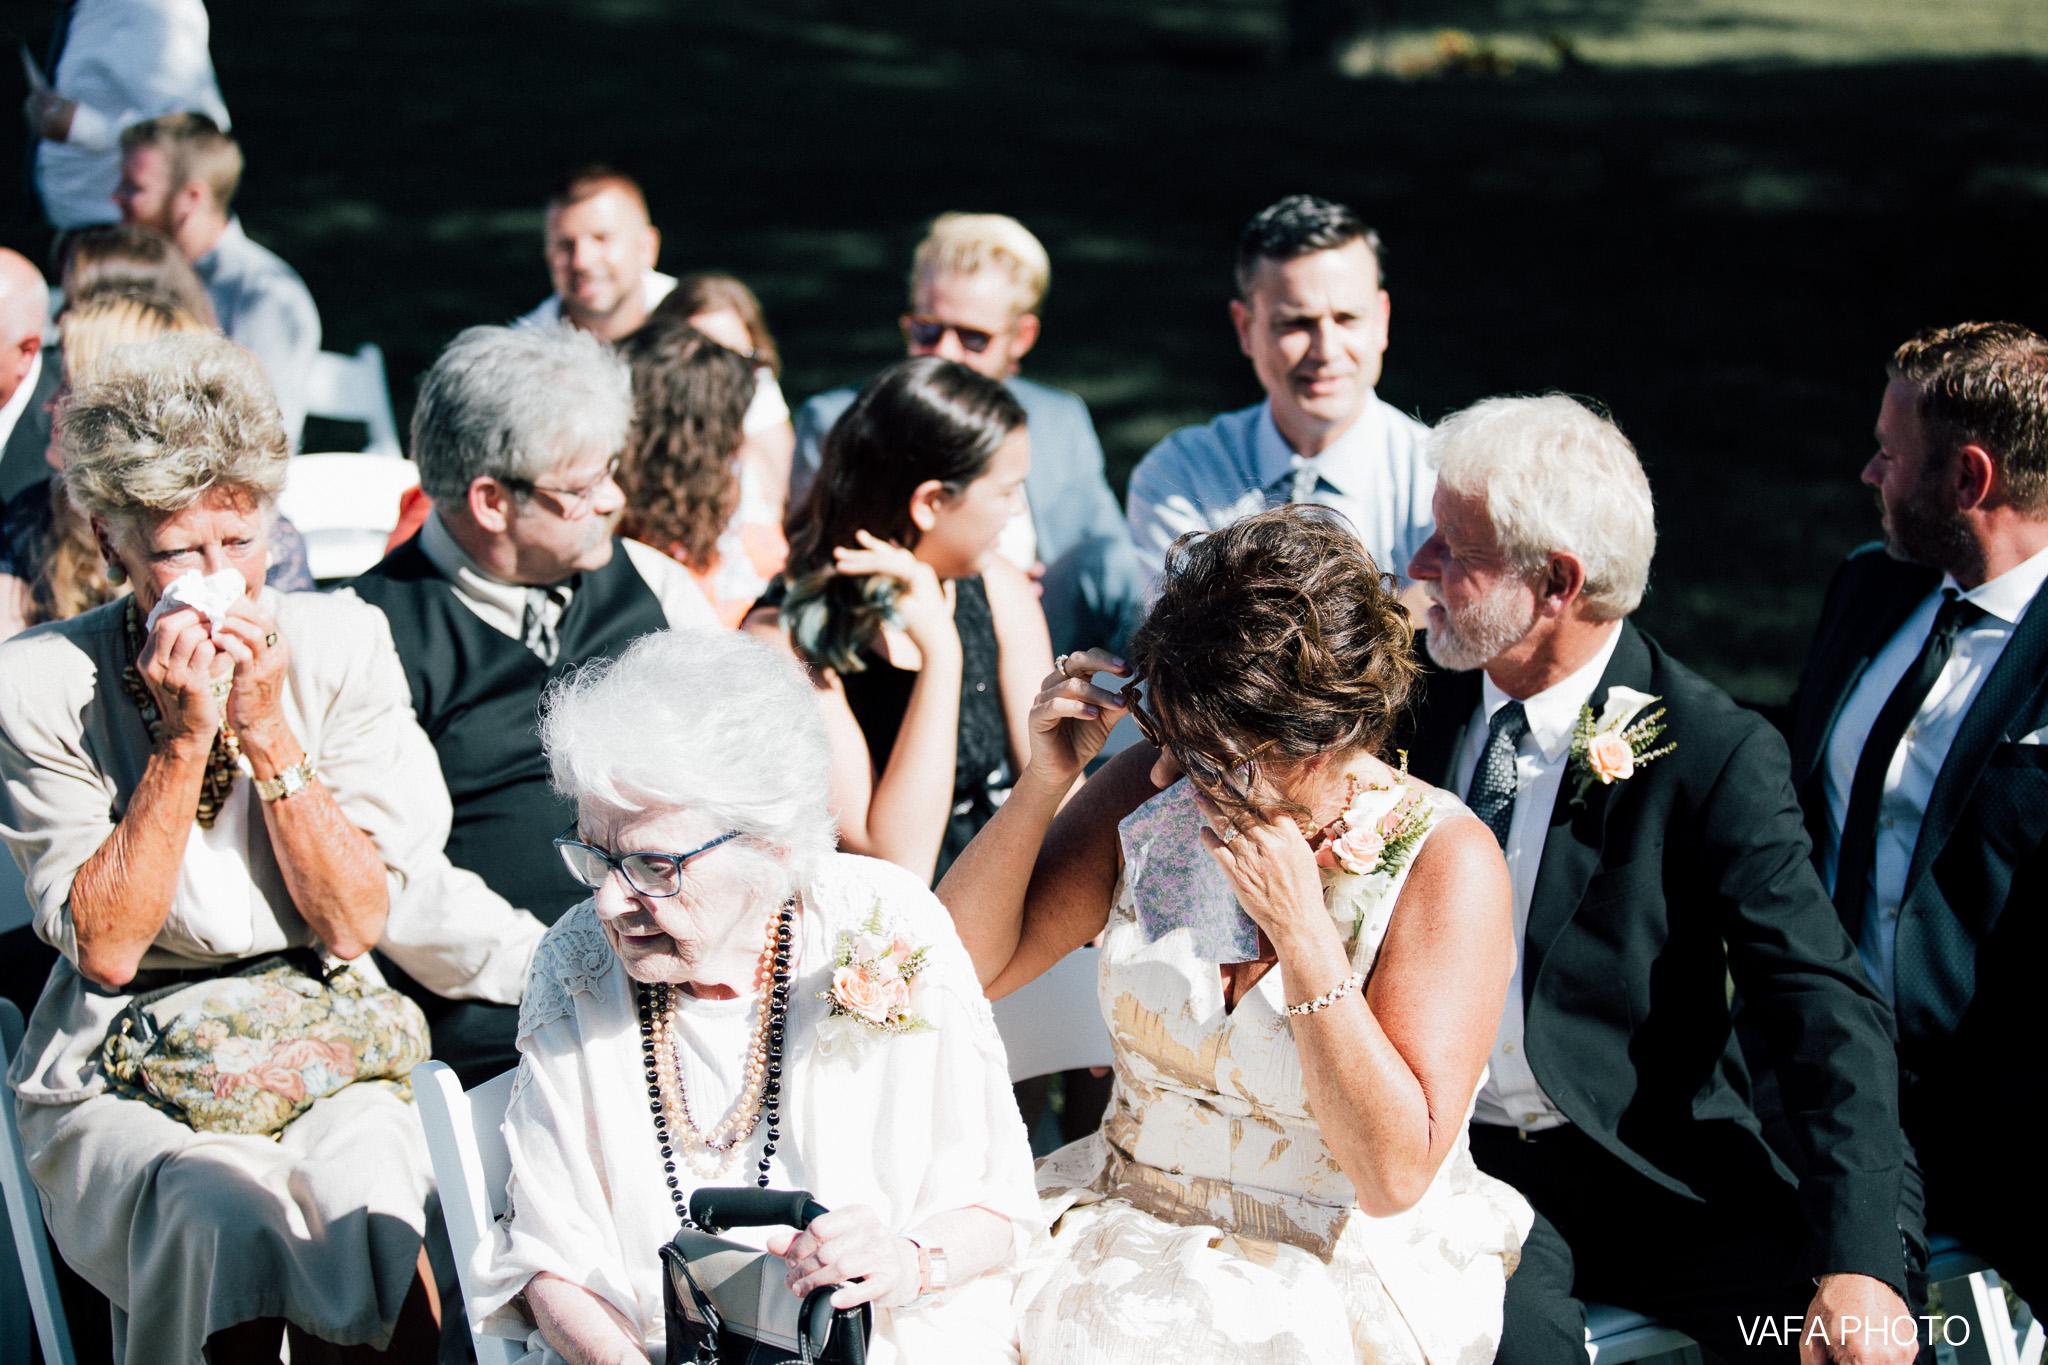 The-Felt-Estate-Wedding-Kailie-David-Vafa-Photo-404.jpg